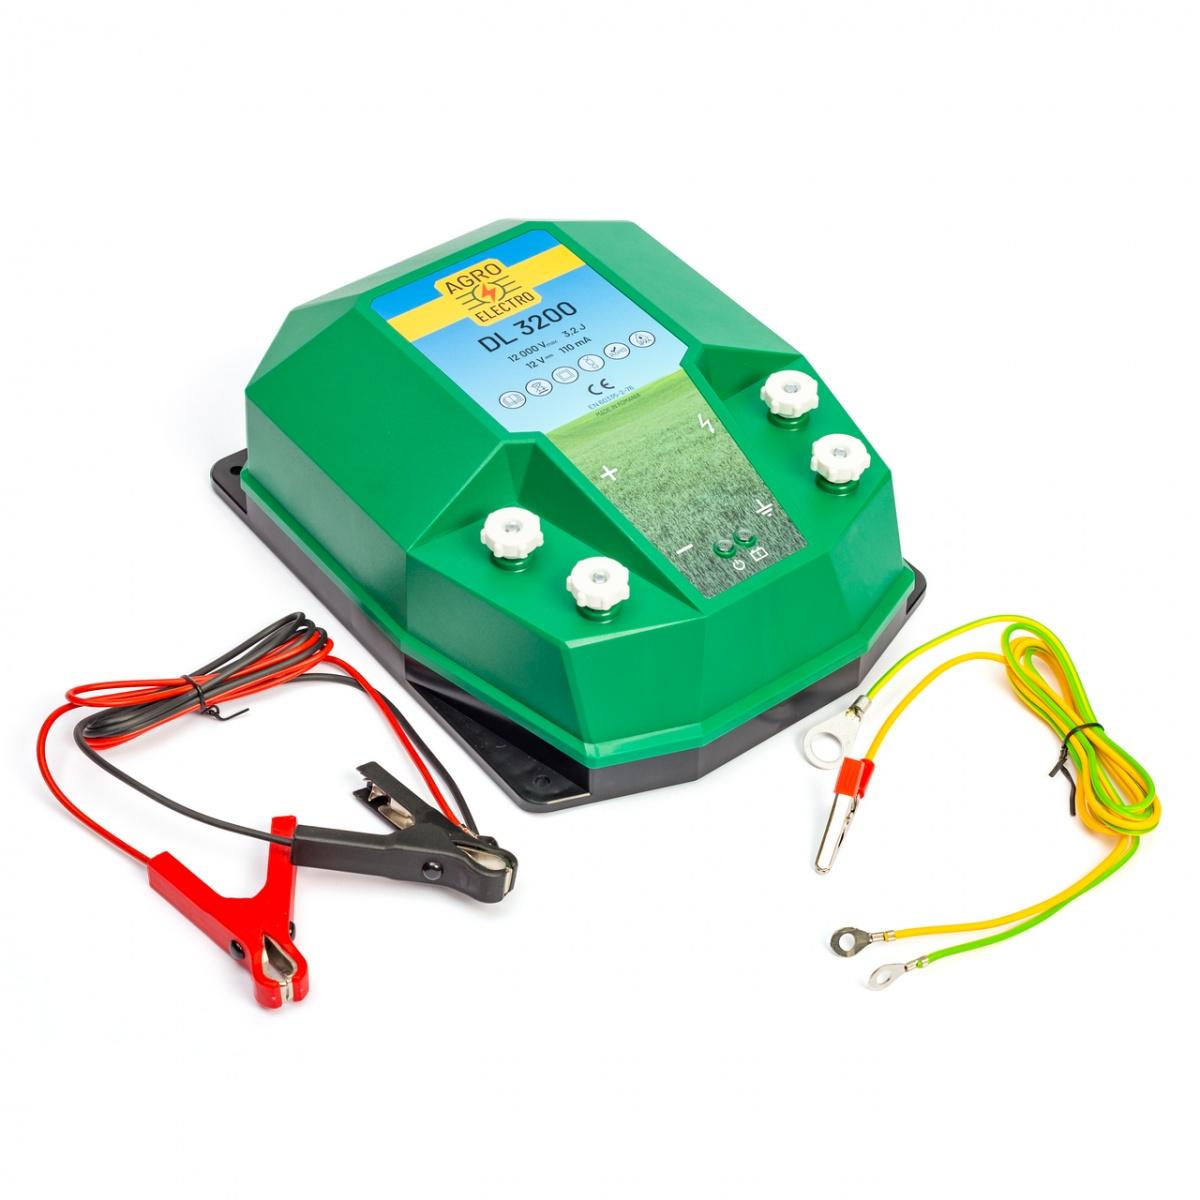 Aparat gard electric DL3200, 12V, 3,2Joule